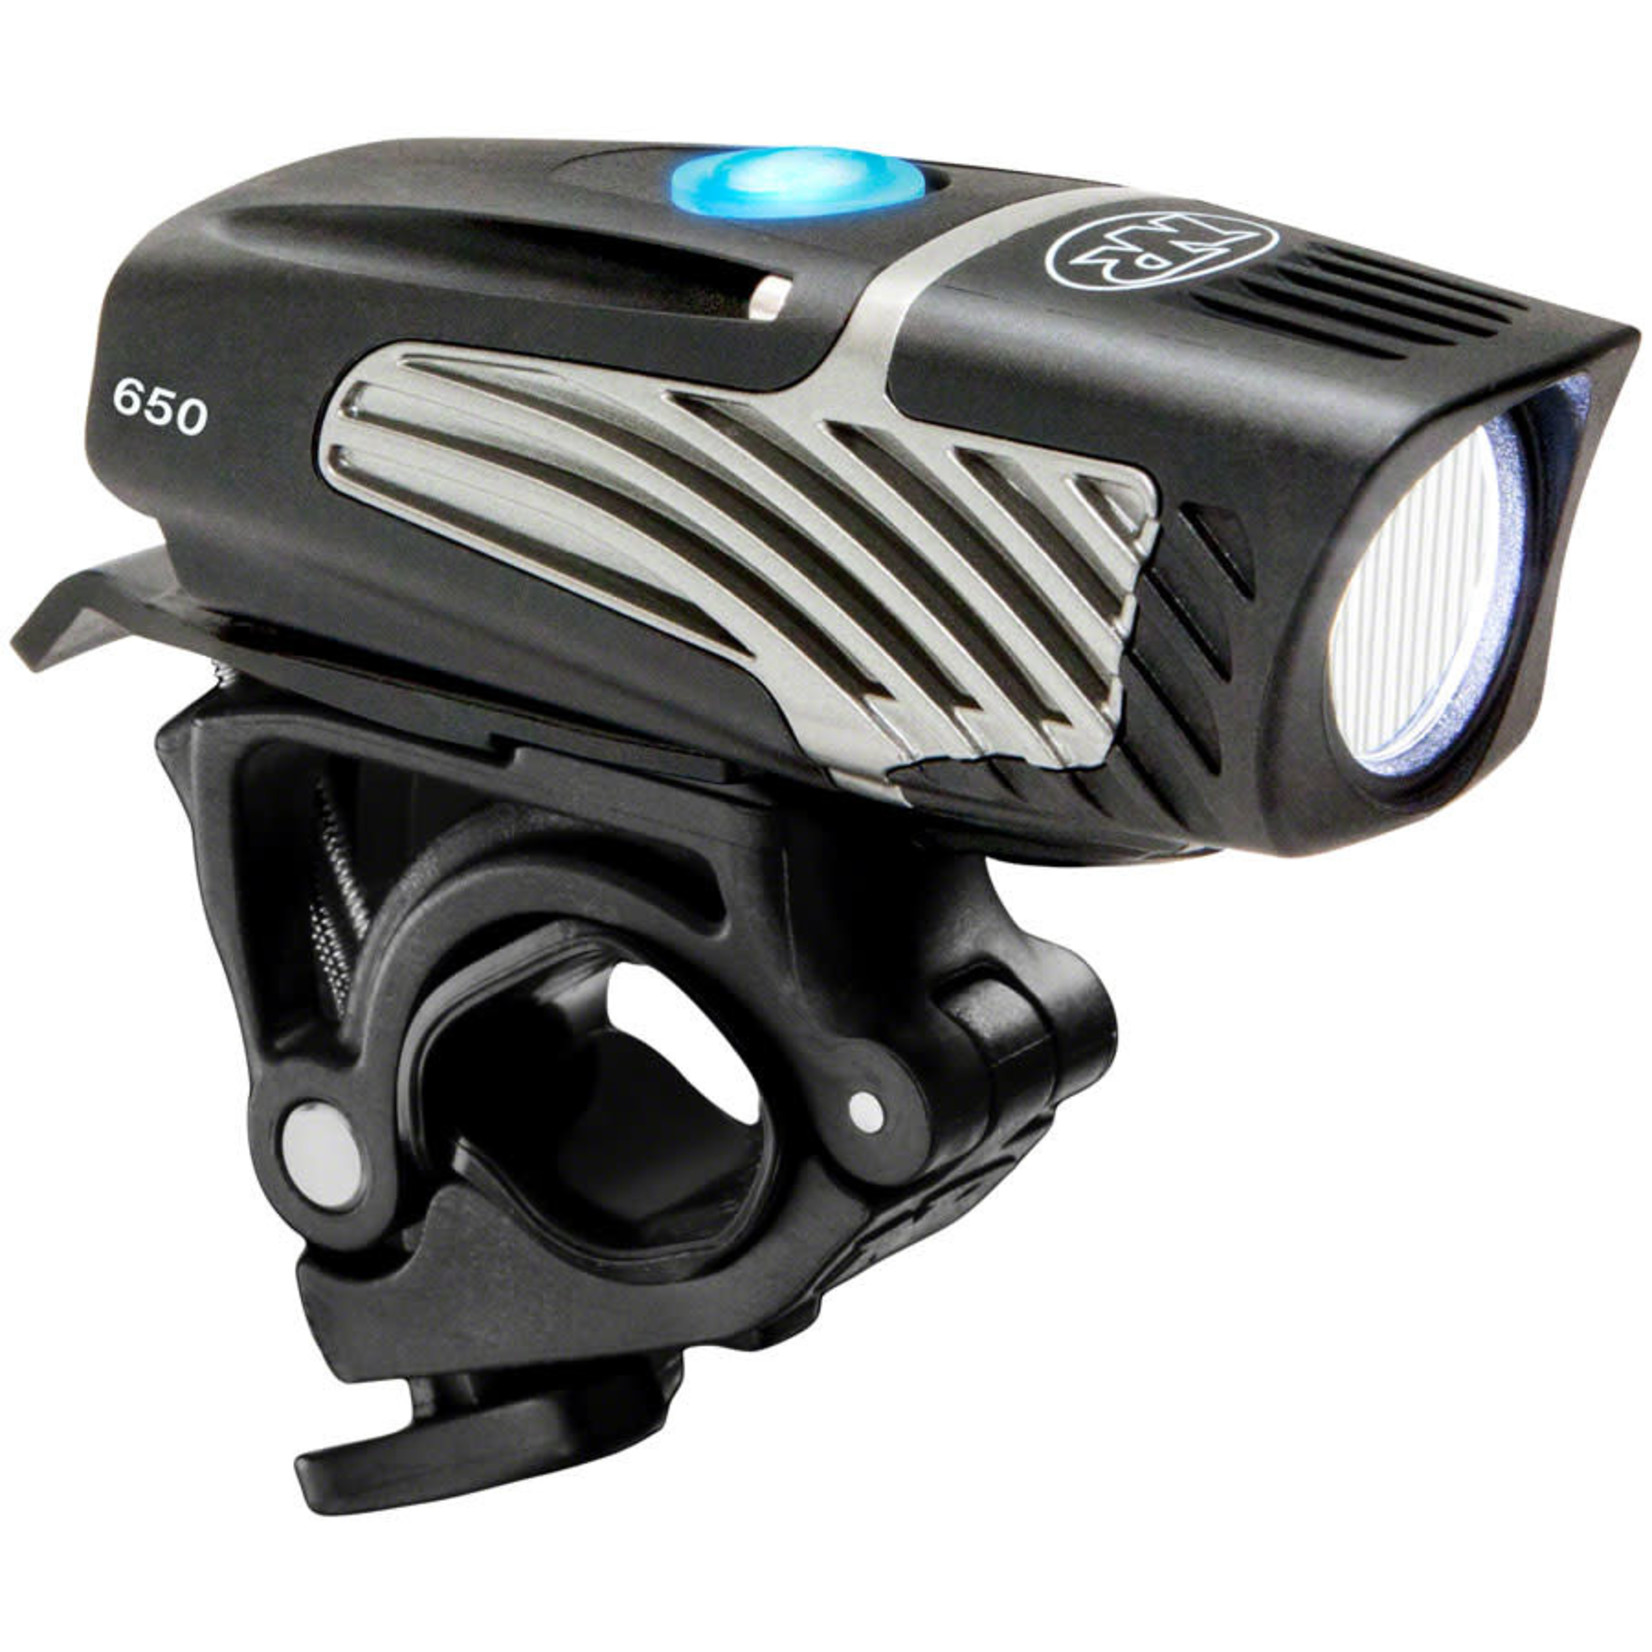 NiteRider NiteRider Lumina Micro 650 Headlight